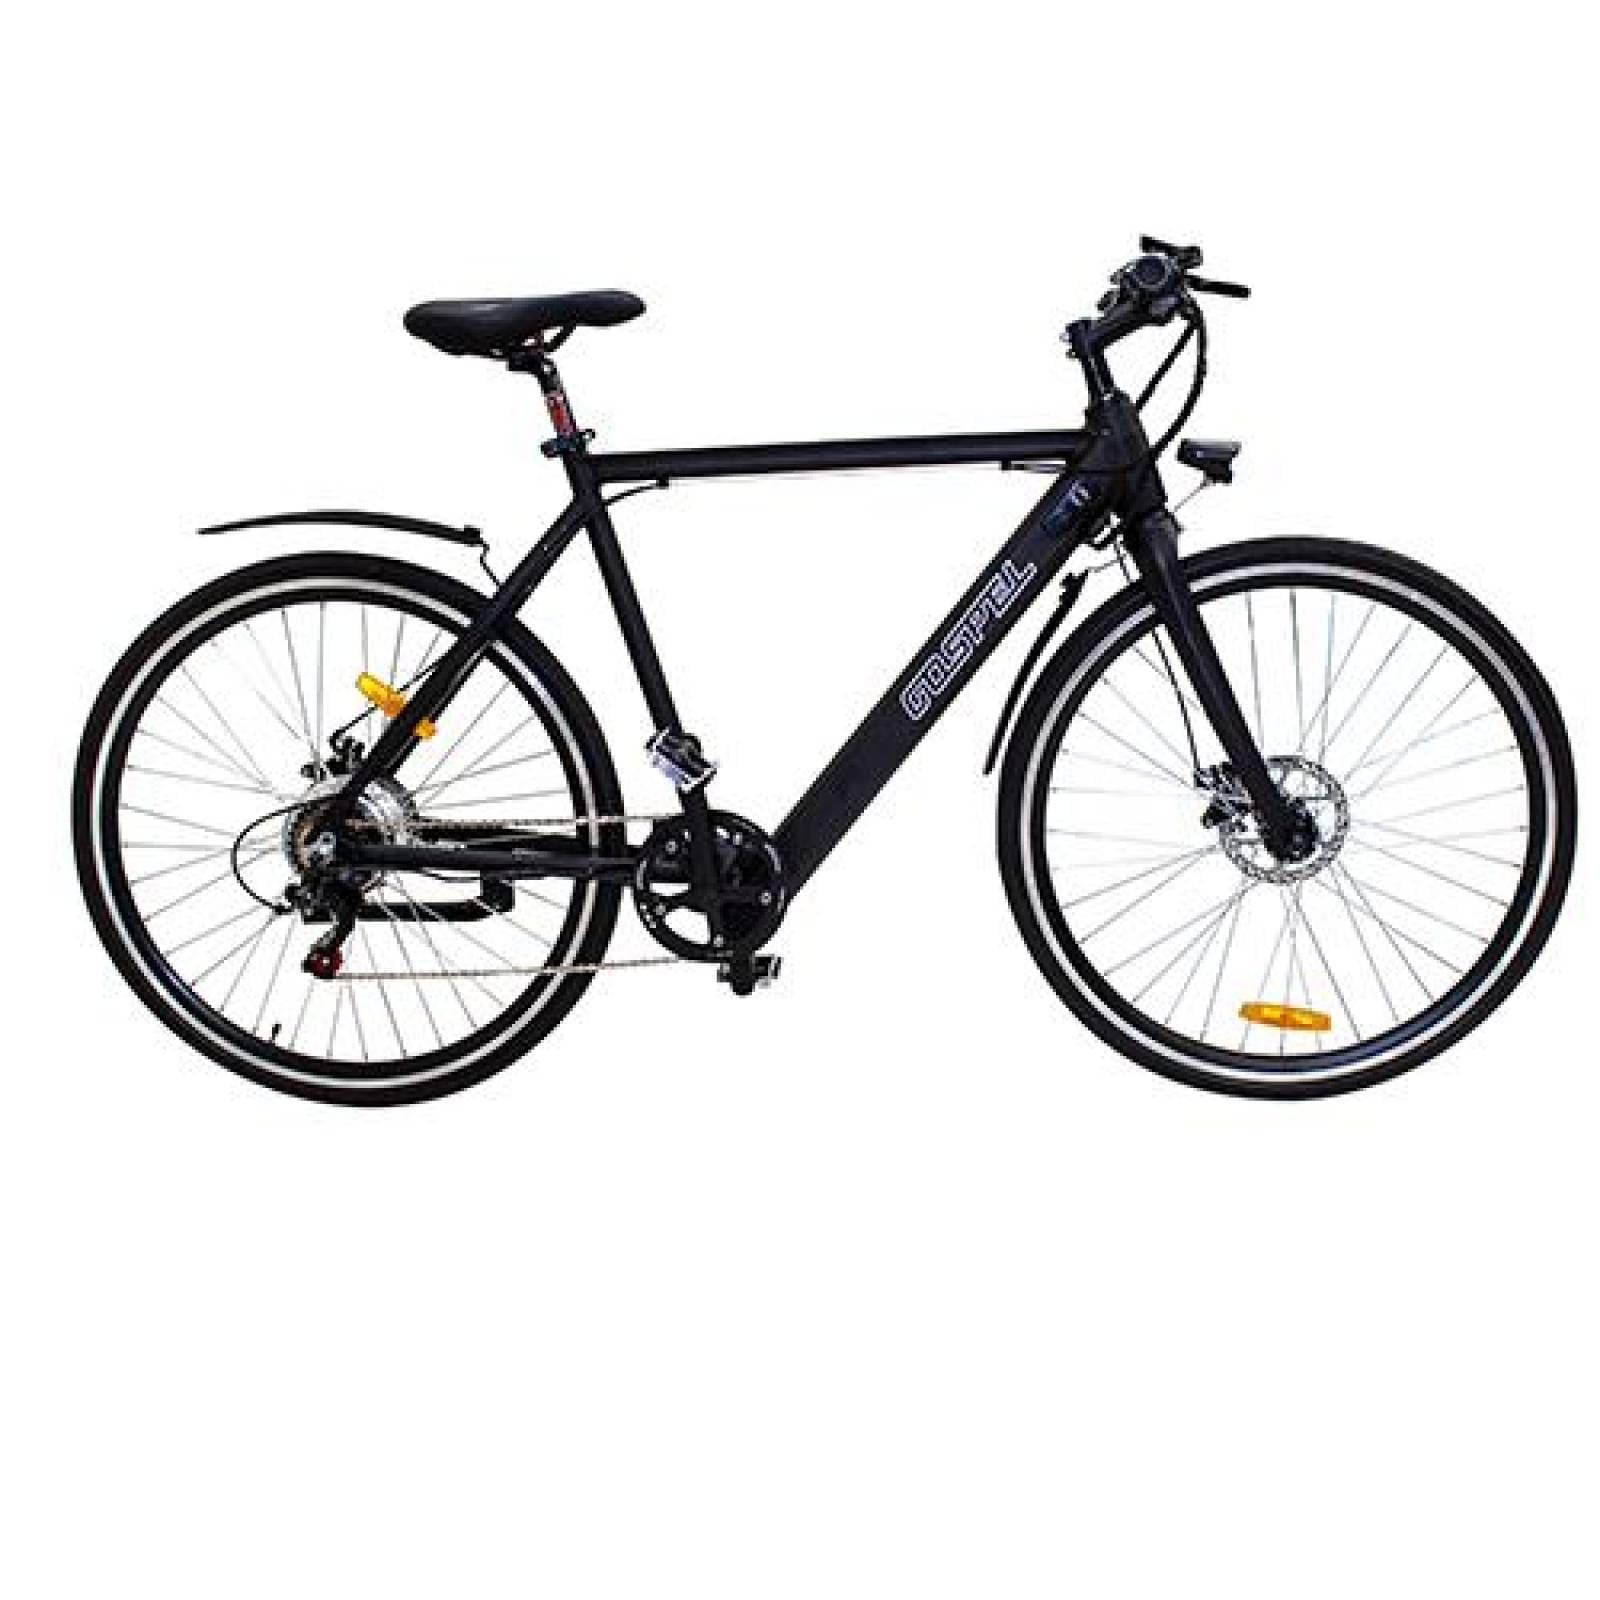 Bicicleta Eléctrica R700 C Road Master Negra Híbrida Gospel